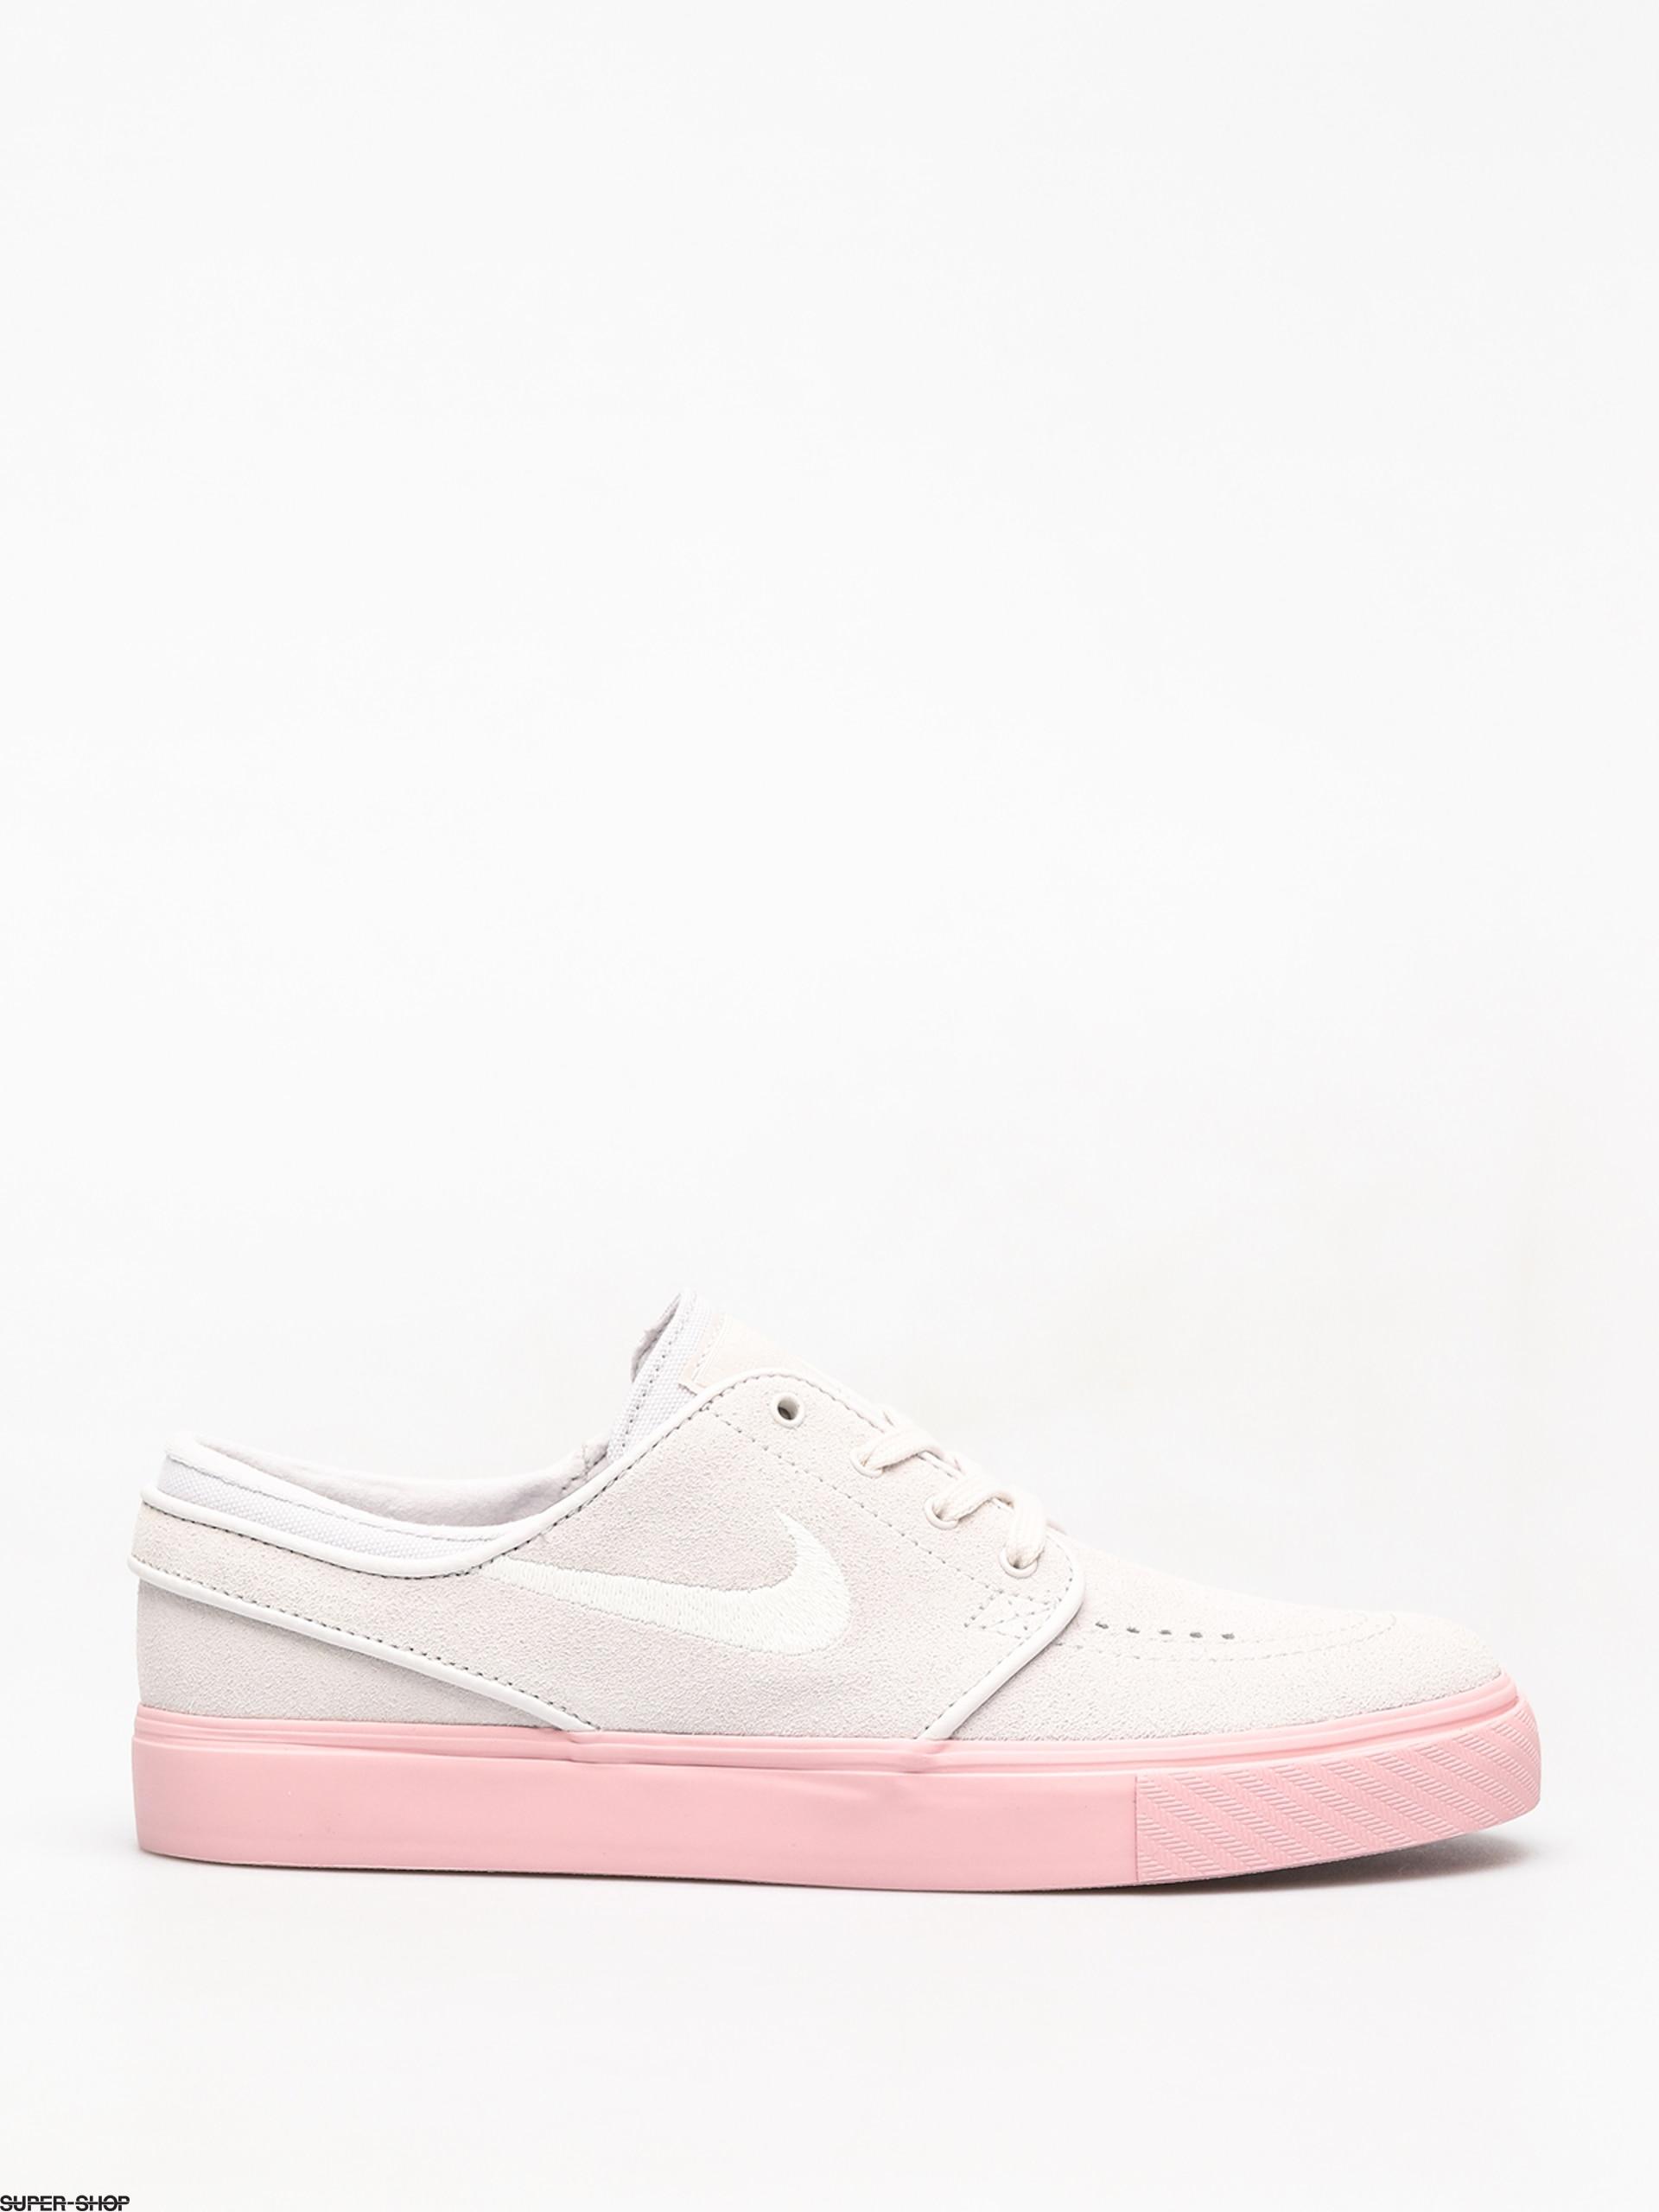 c6a9ca1b44ad8 Nike SB Zoom Stefan Janoski Shoes (vast grey phantom bubblegum bubblegum)